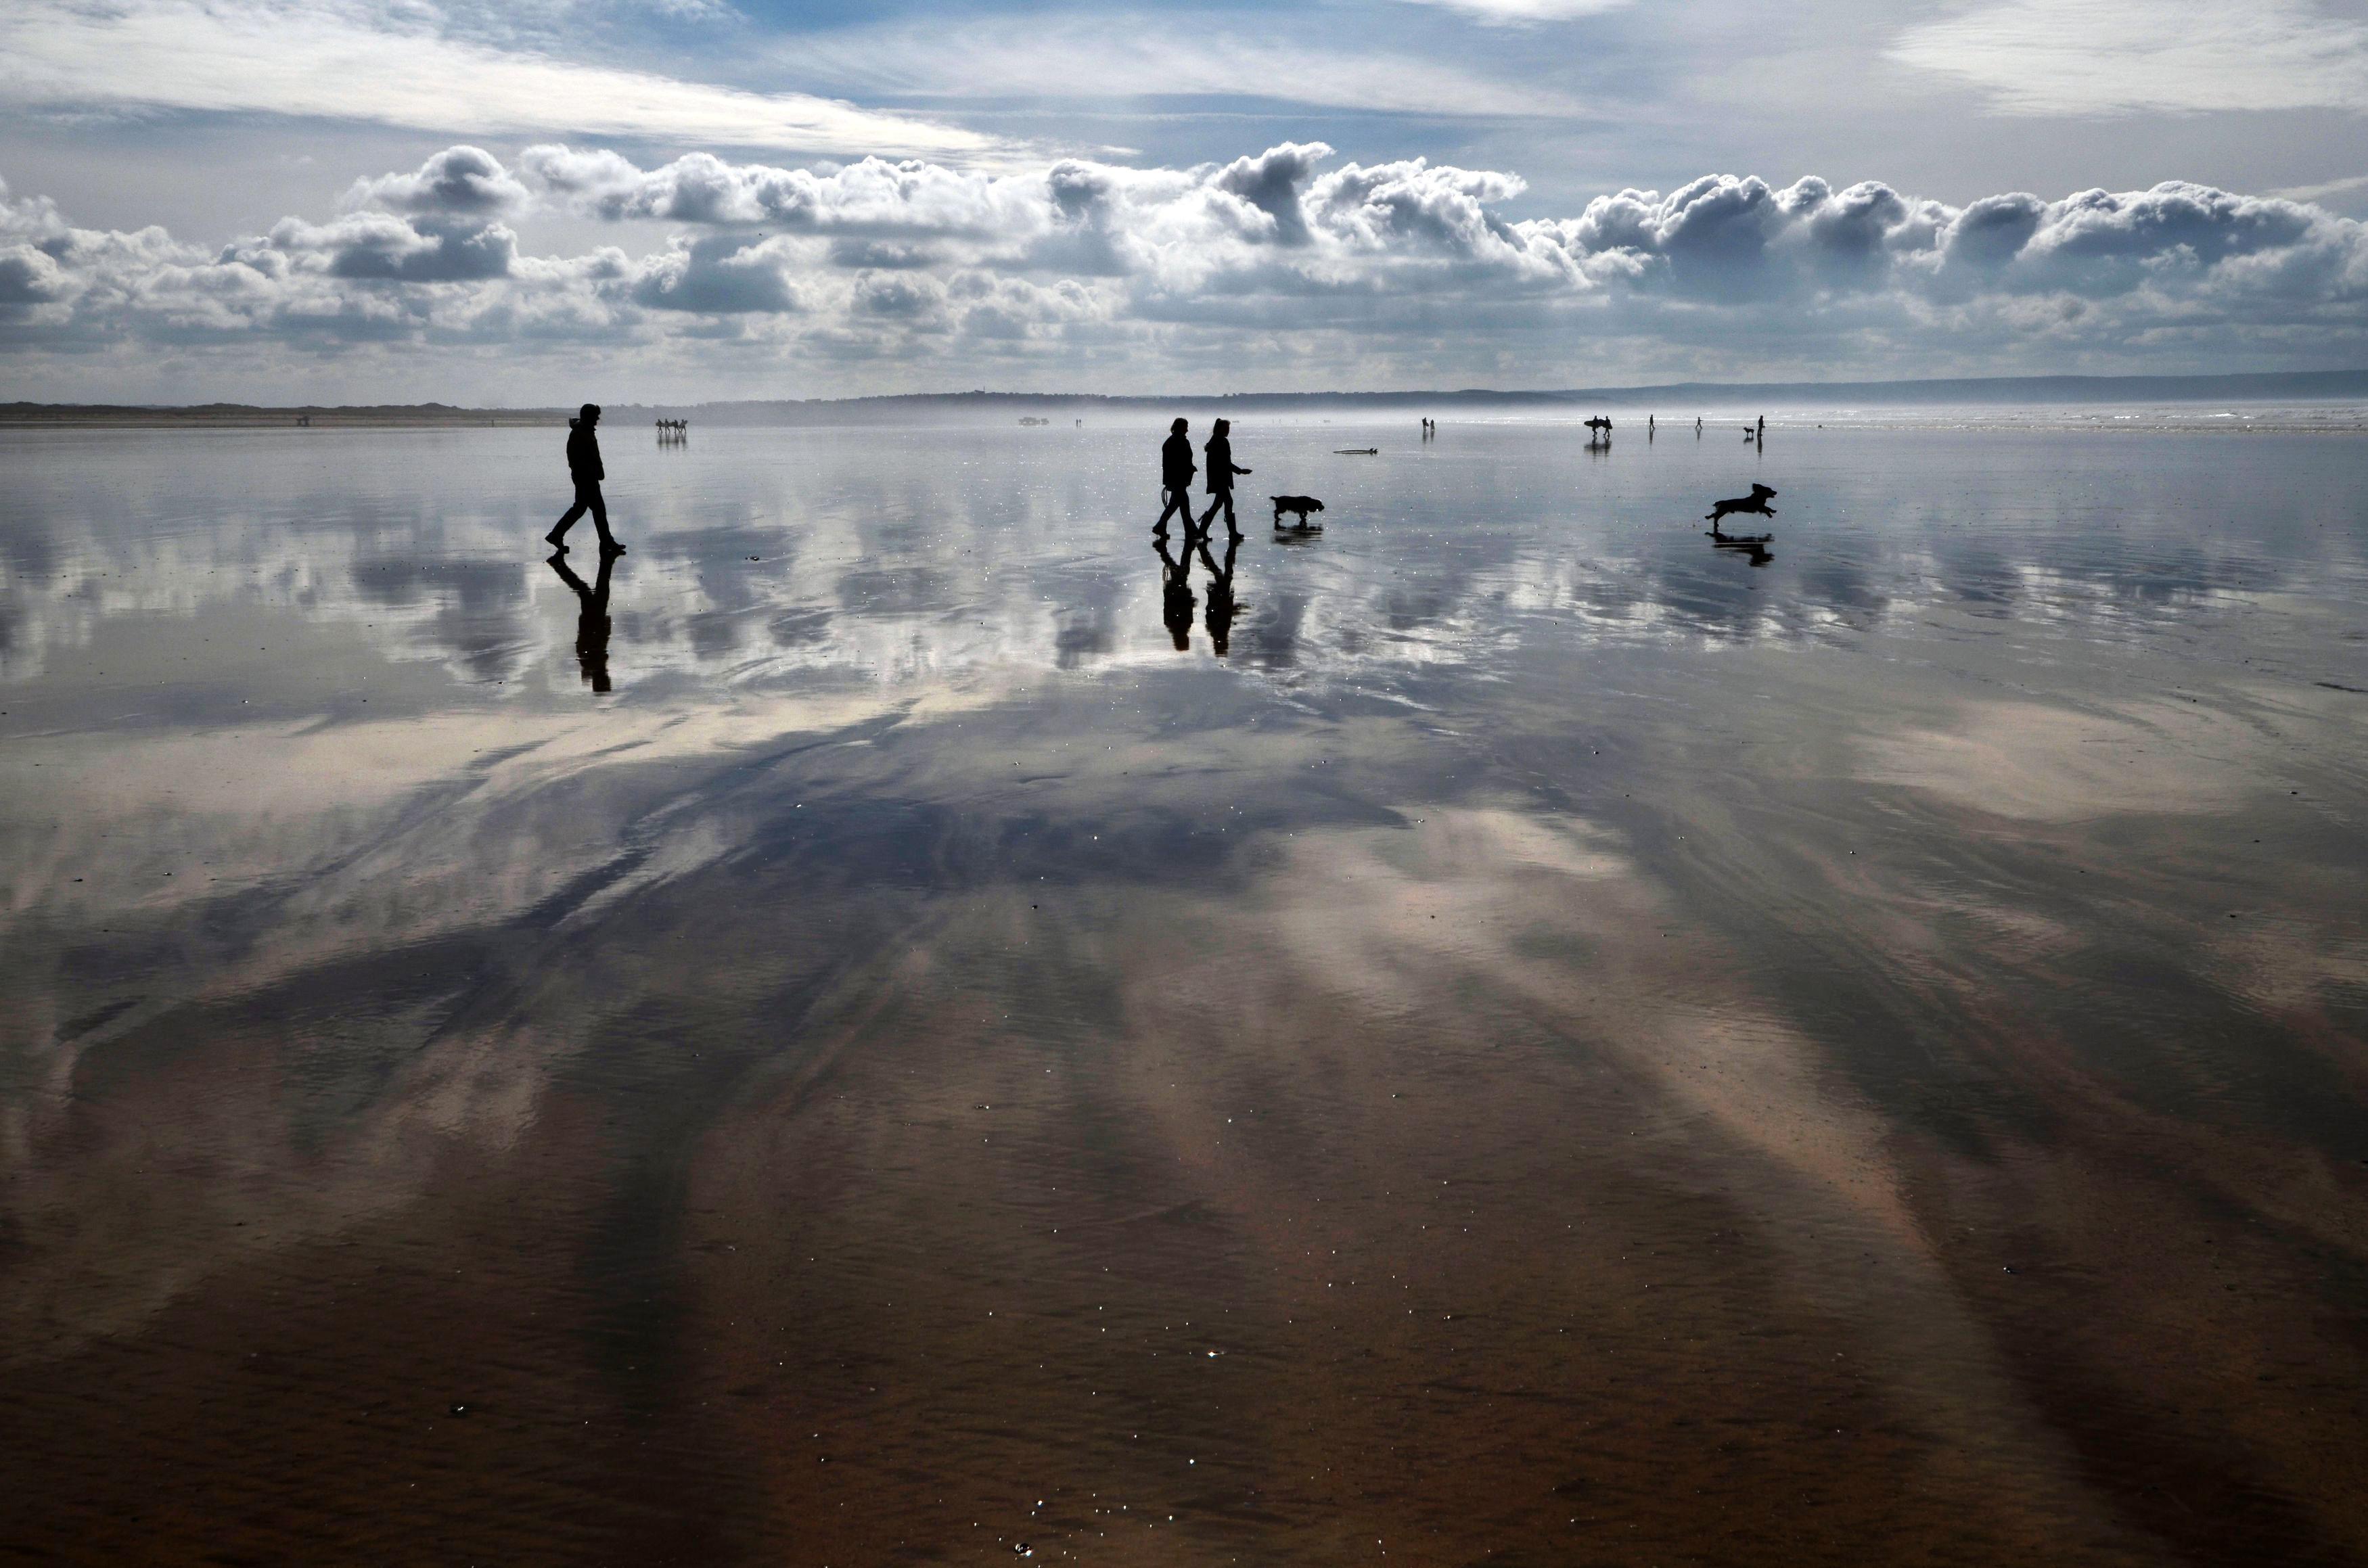 Слайд 29 из 86: Dog walkers silhouetted on the beach enjoy the mild weather at Saunton Sands, North Devon.